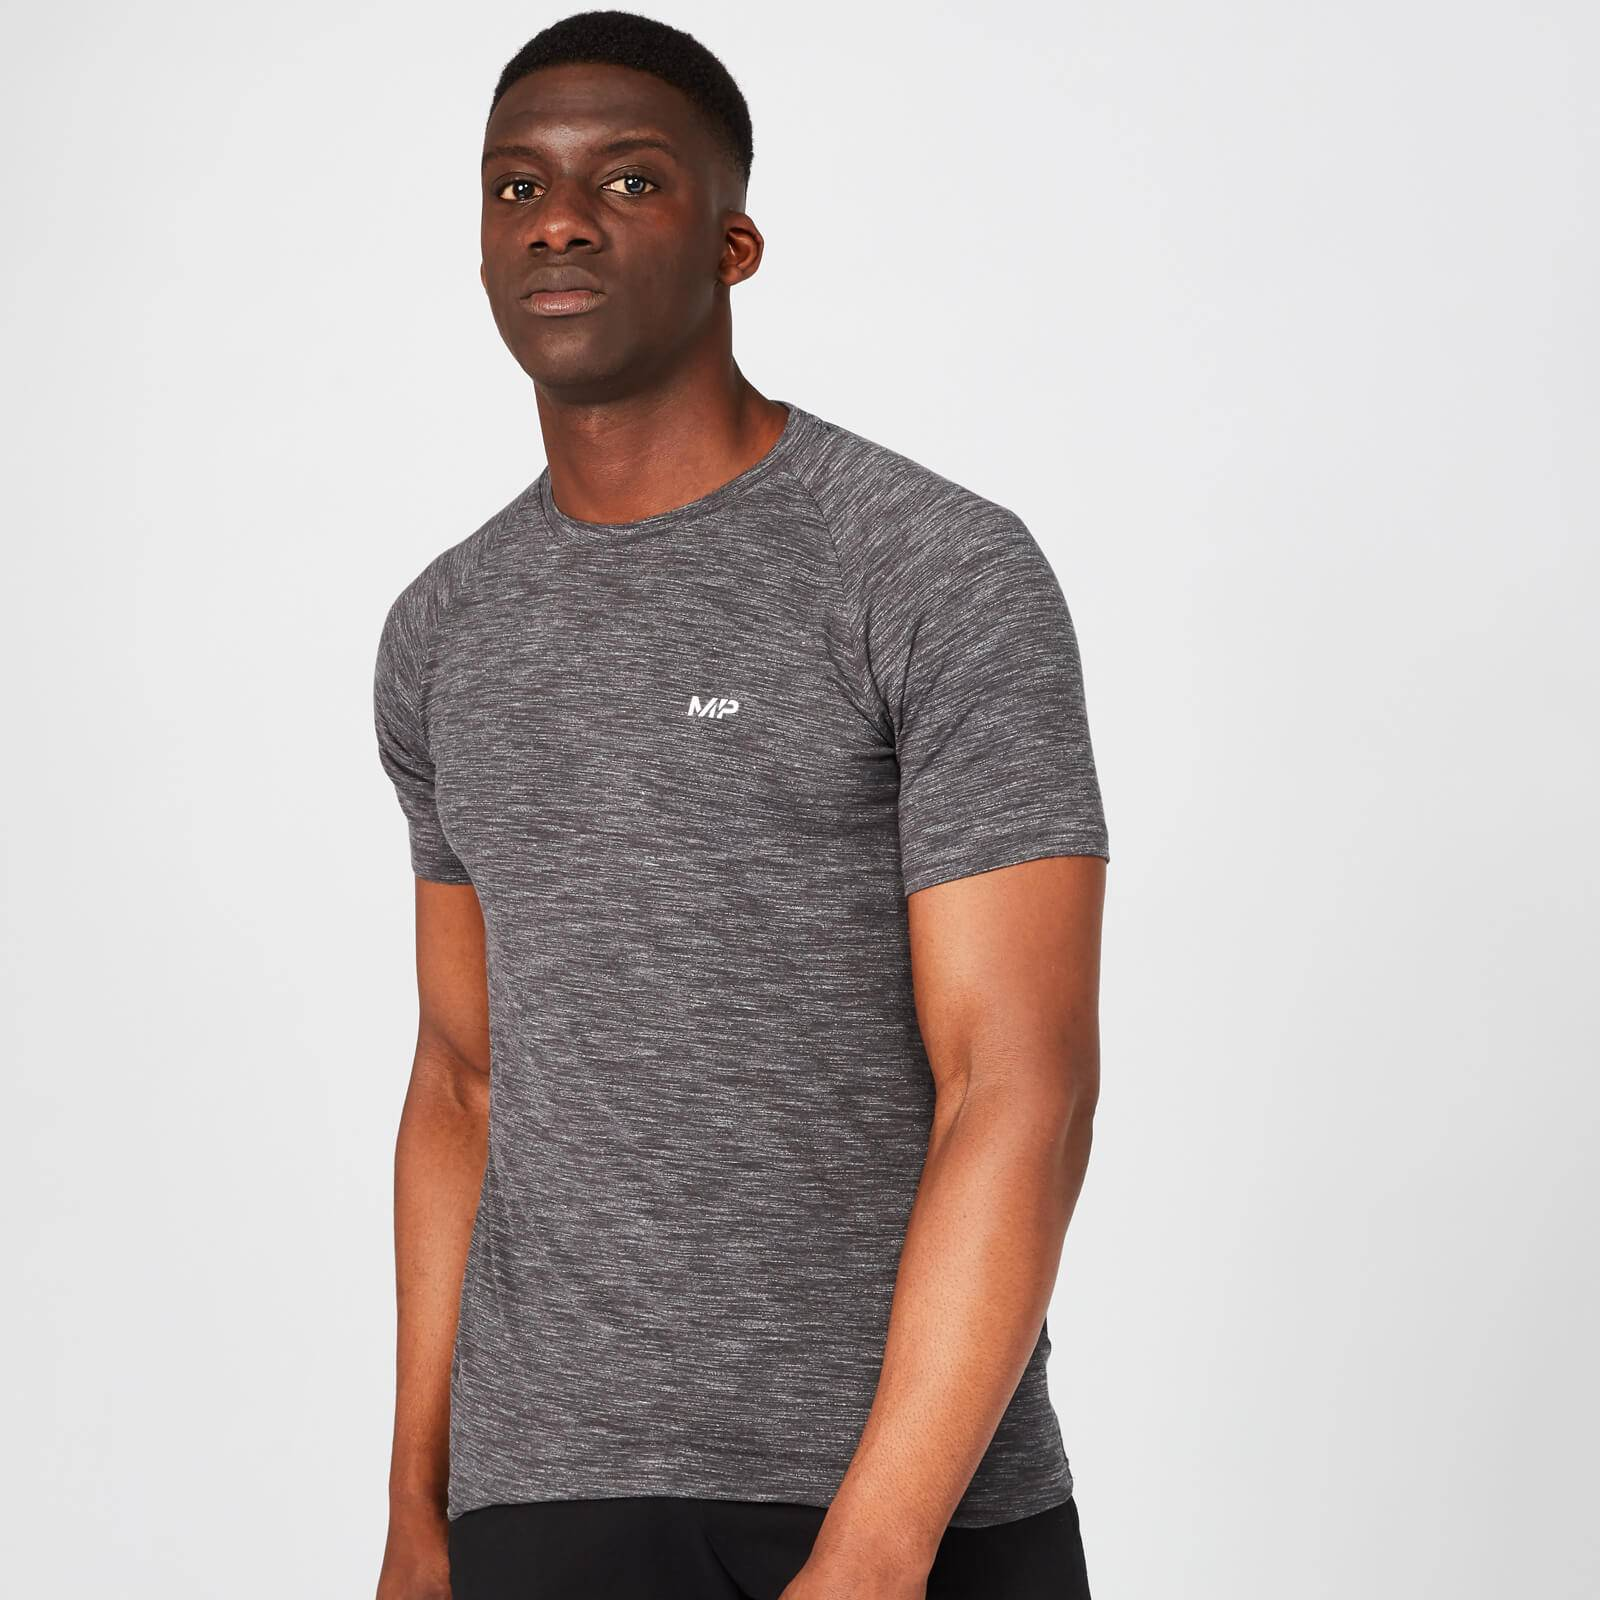 Myprotein MP Performance T-Shirt - Black Marl - XS